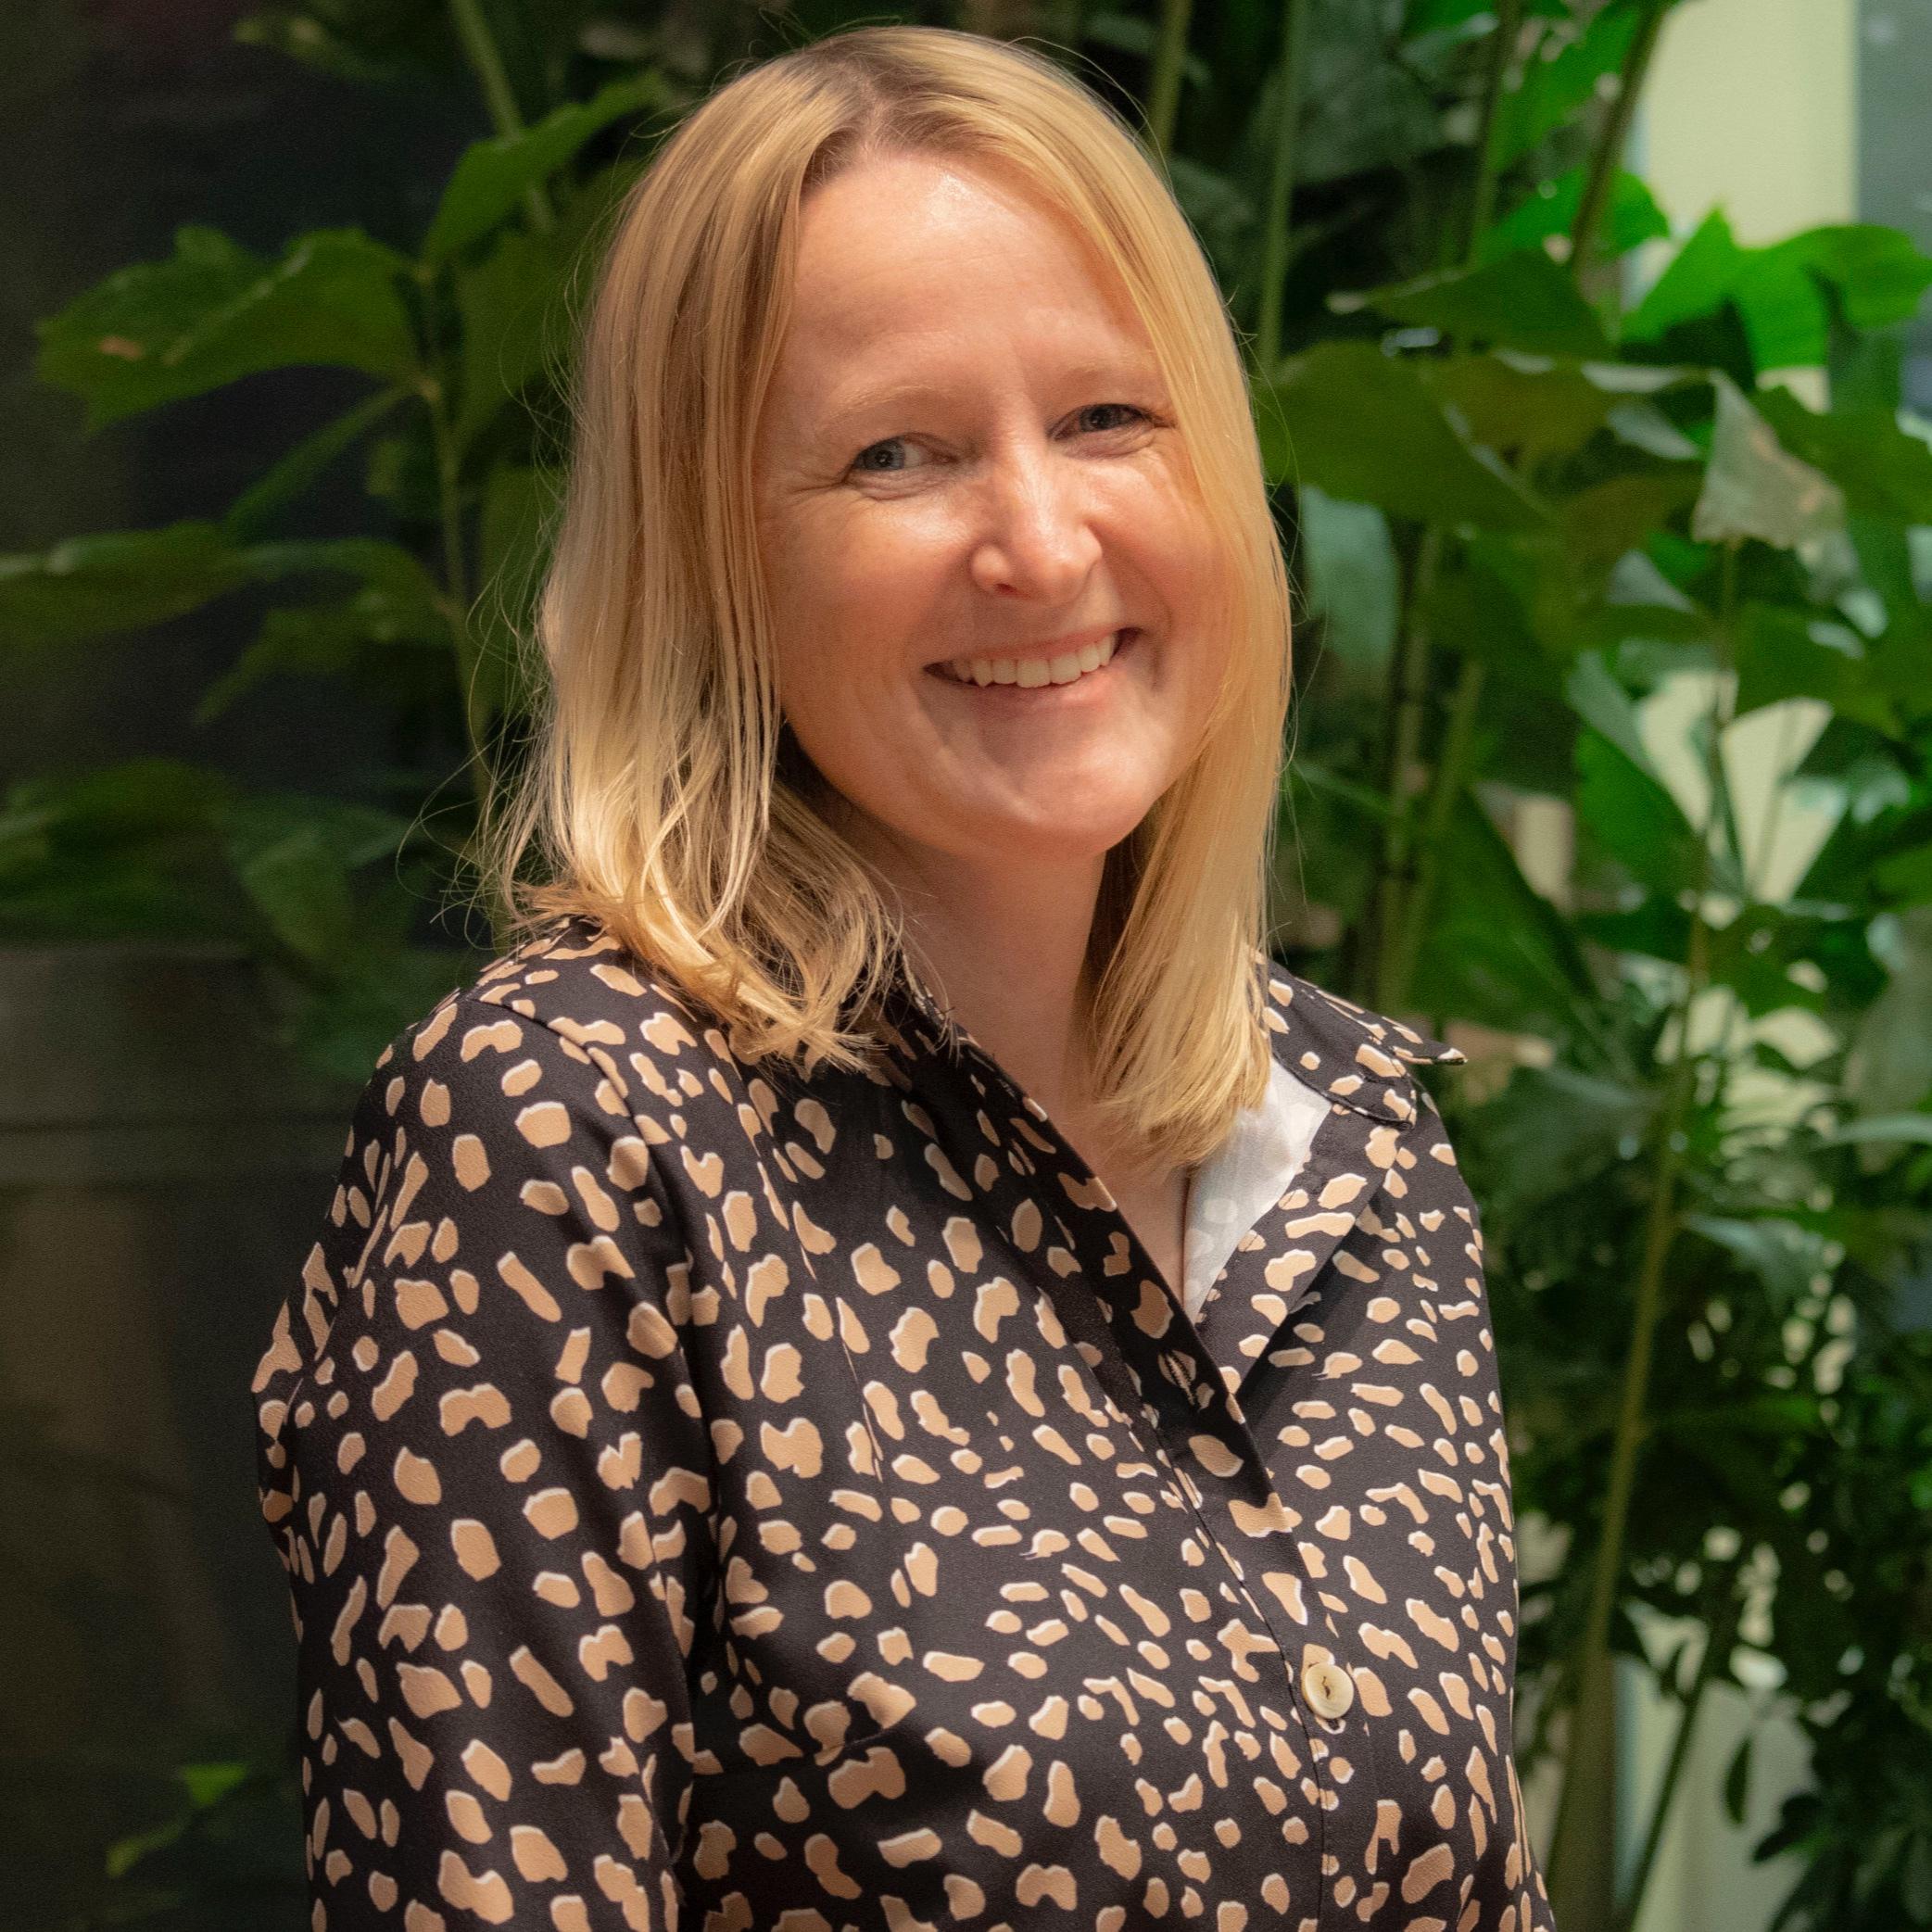 Nicola Sharp-Jeffs, Director, Surviving Economic Abuse (UK)